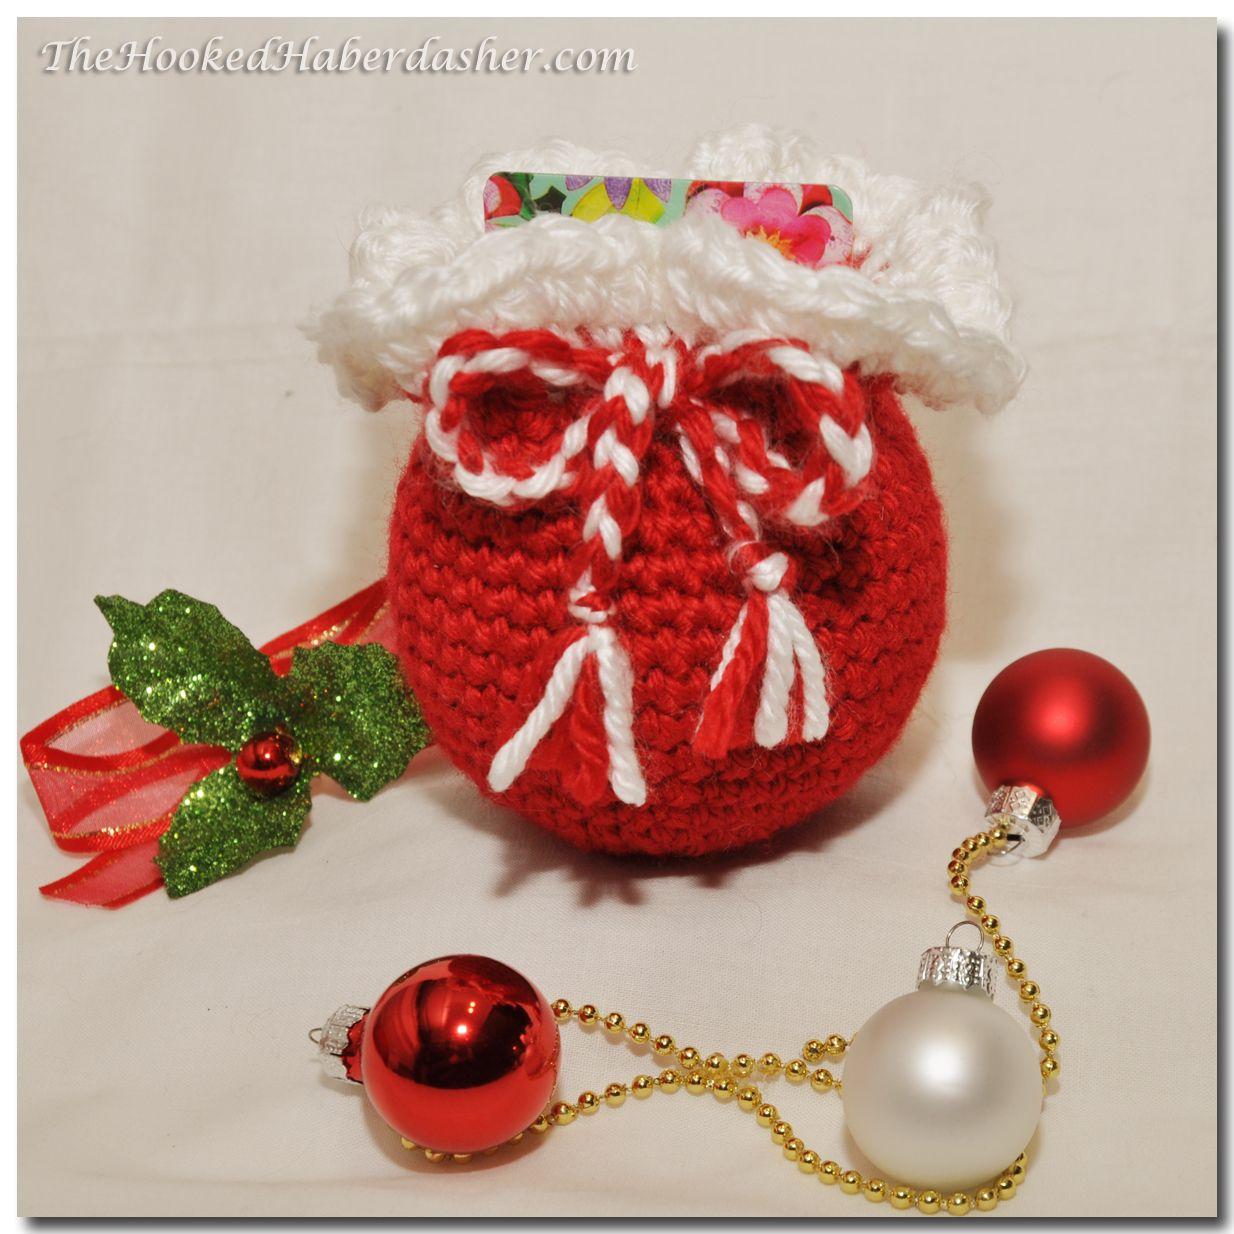 Free santas sack gift card holder ornament2 crochet gift card santa gift bag ornament by the hooked haberdasher bankloansurffo Gallery